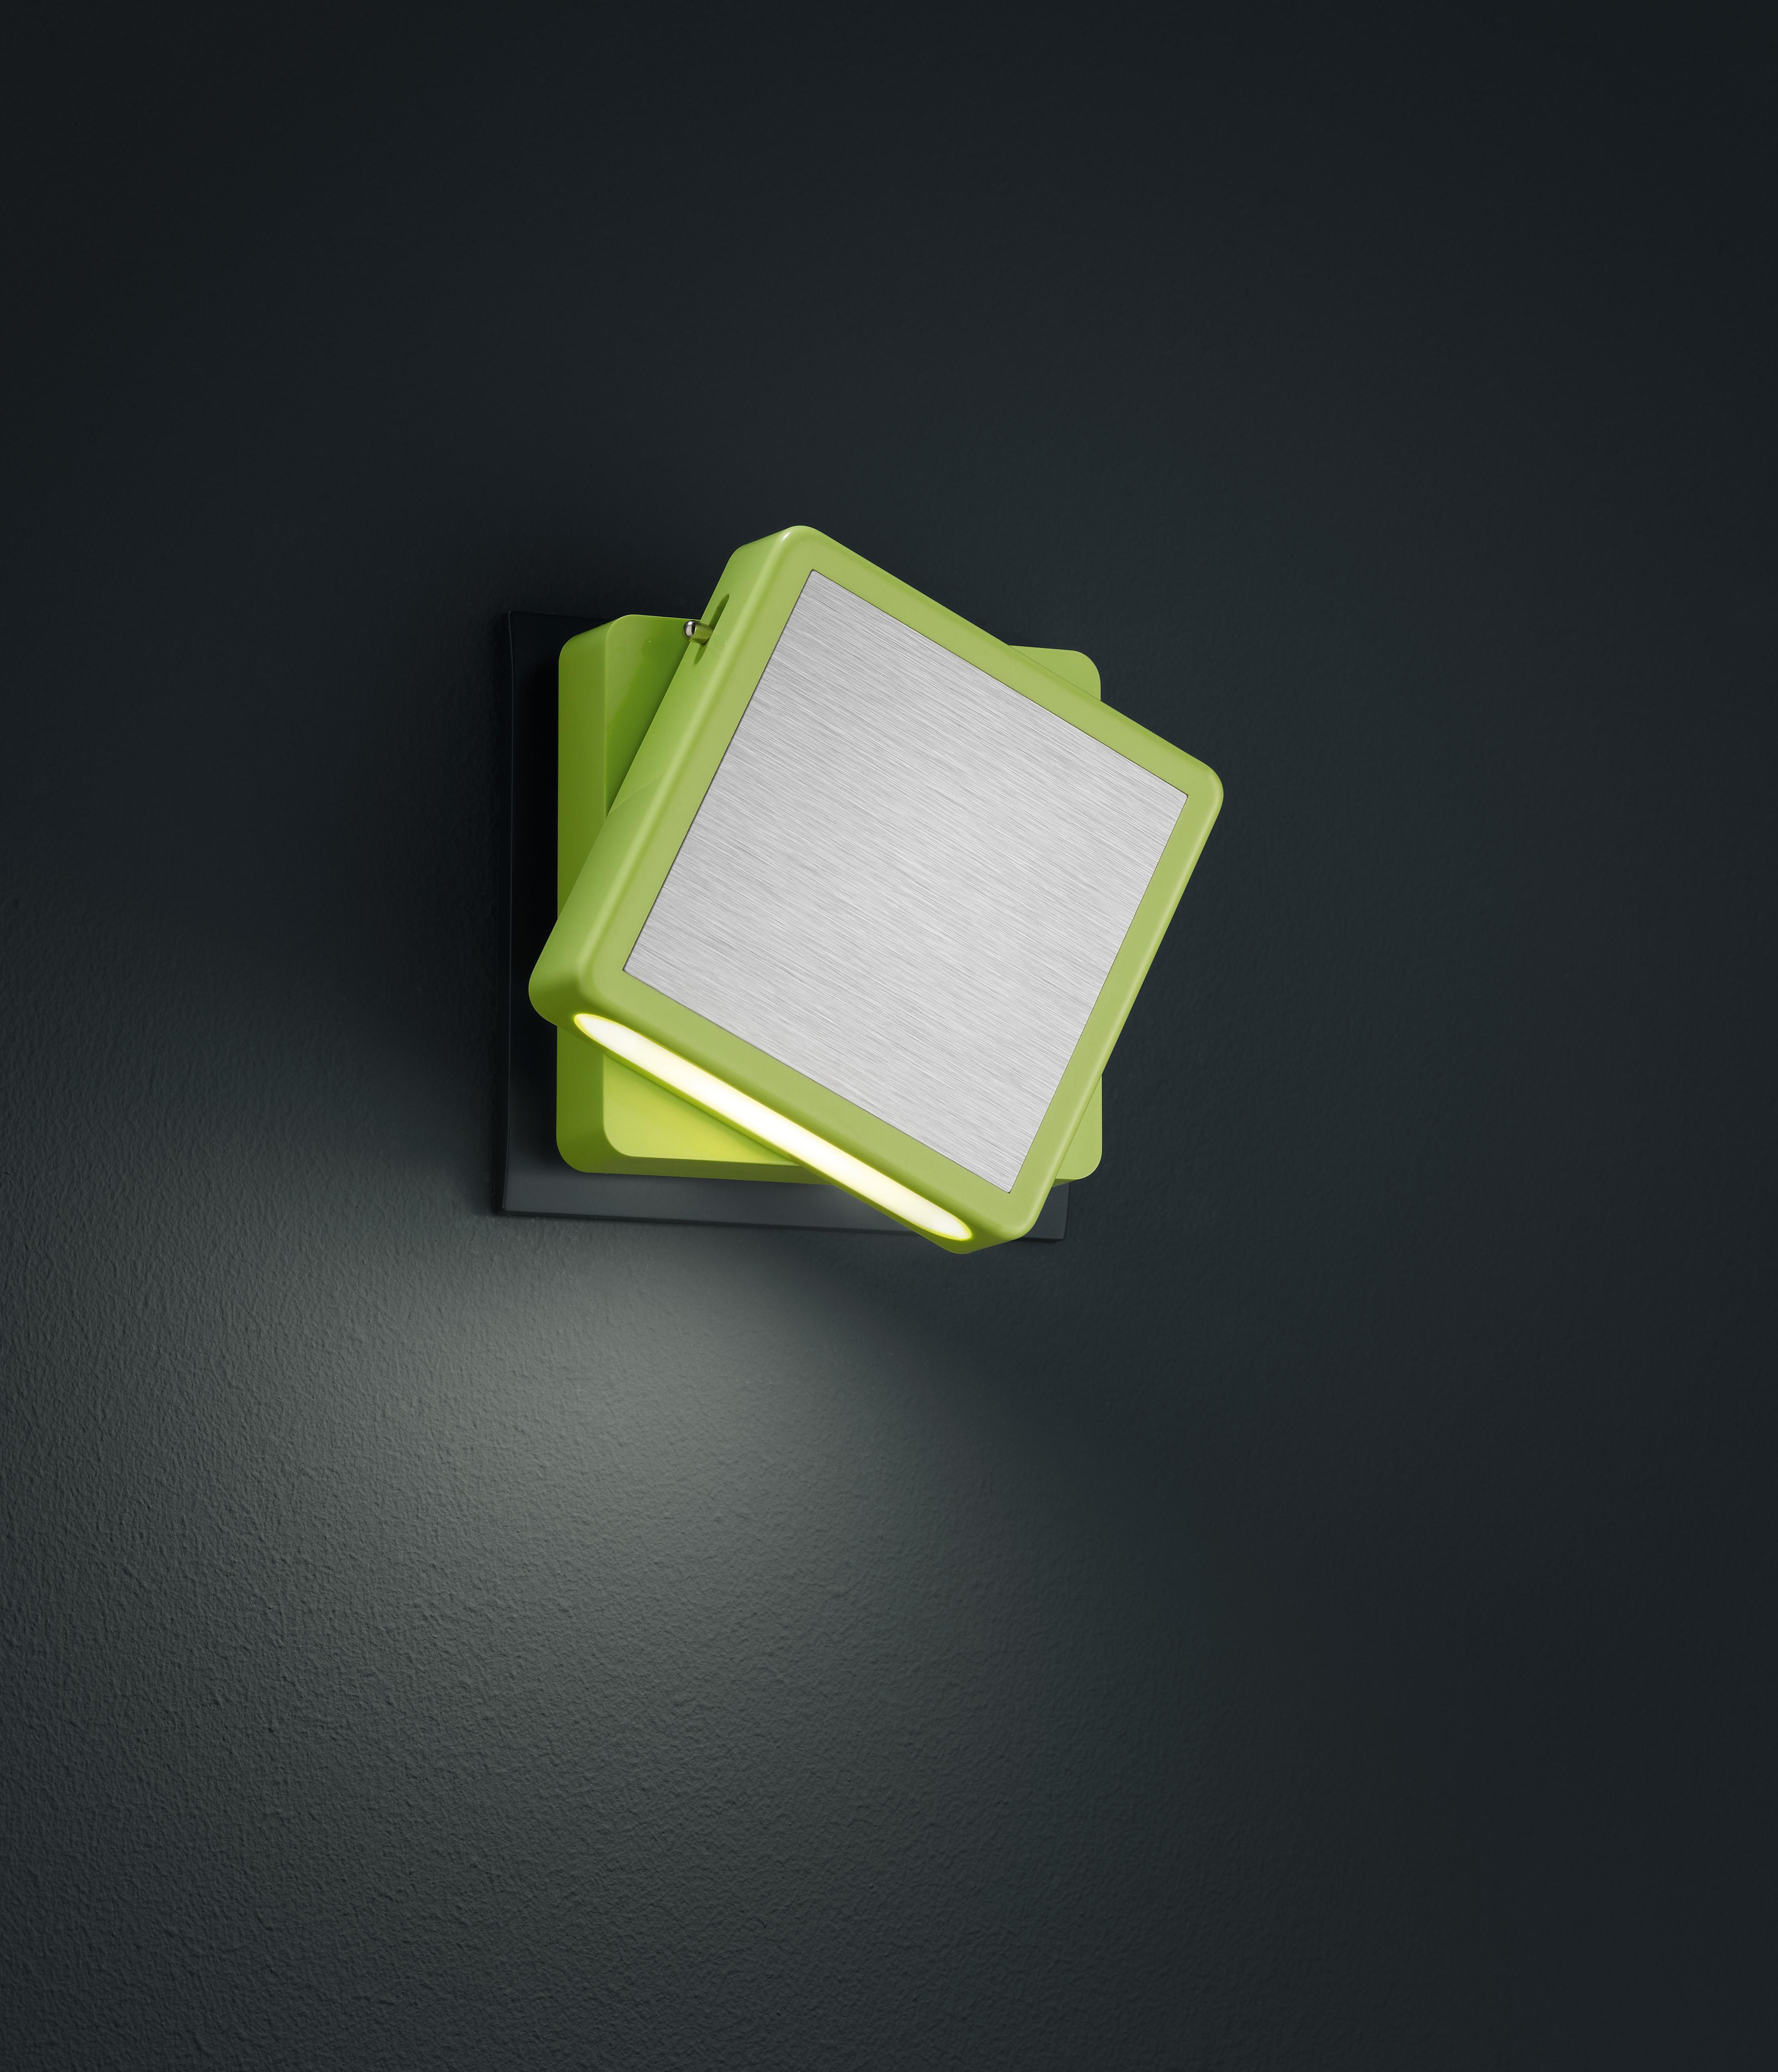 trio leuchten led nachtlicht foxi stecker spot silbergrau 25787 beleuchtung. Black Bedroom Furniture Sets. Home Design Ideas